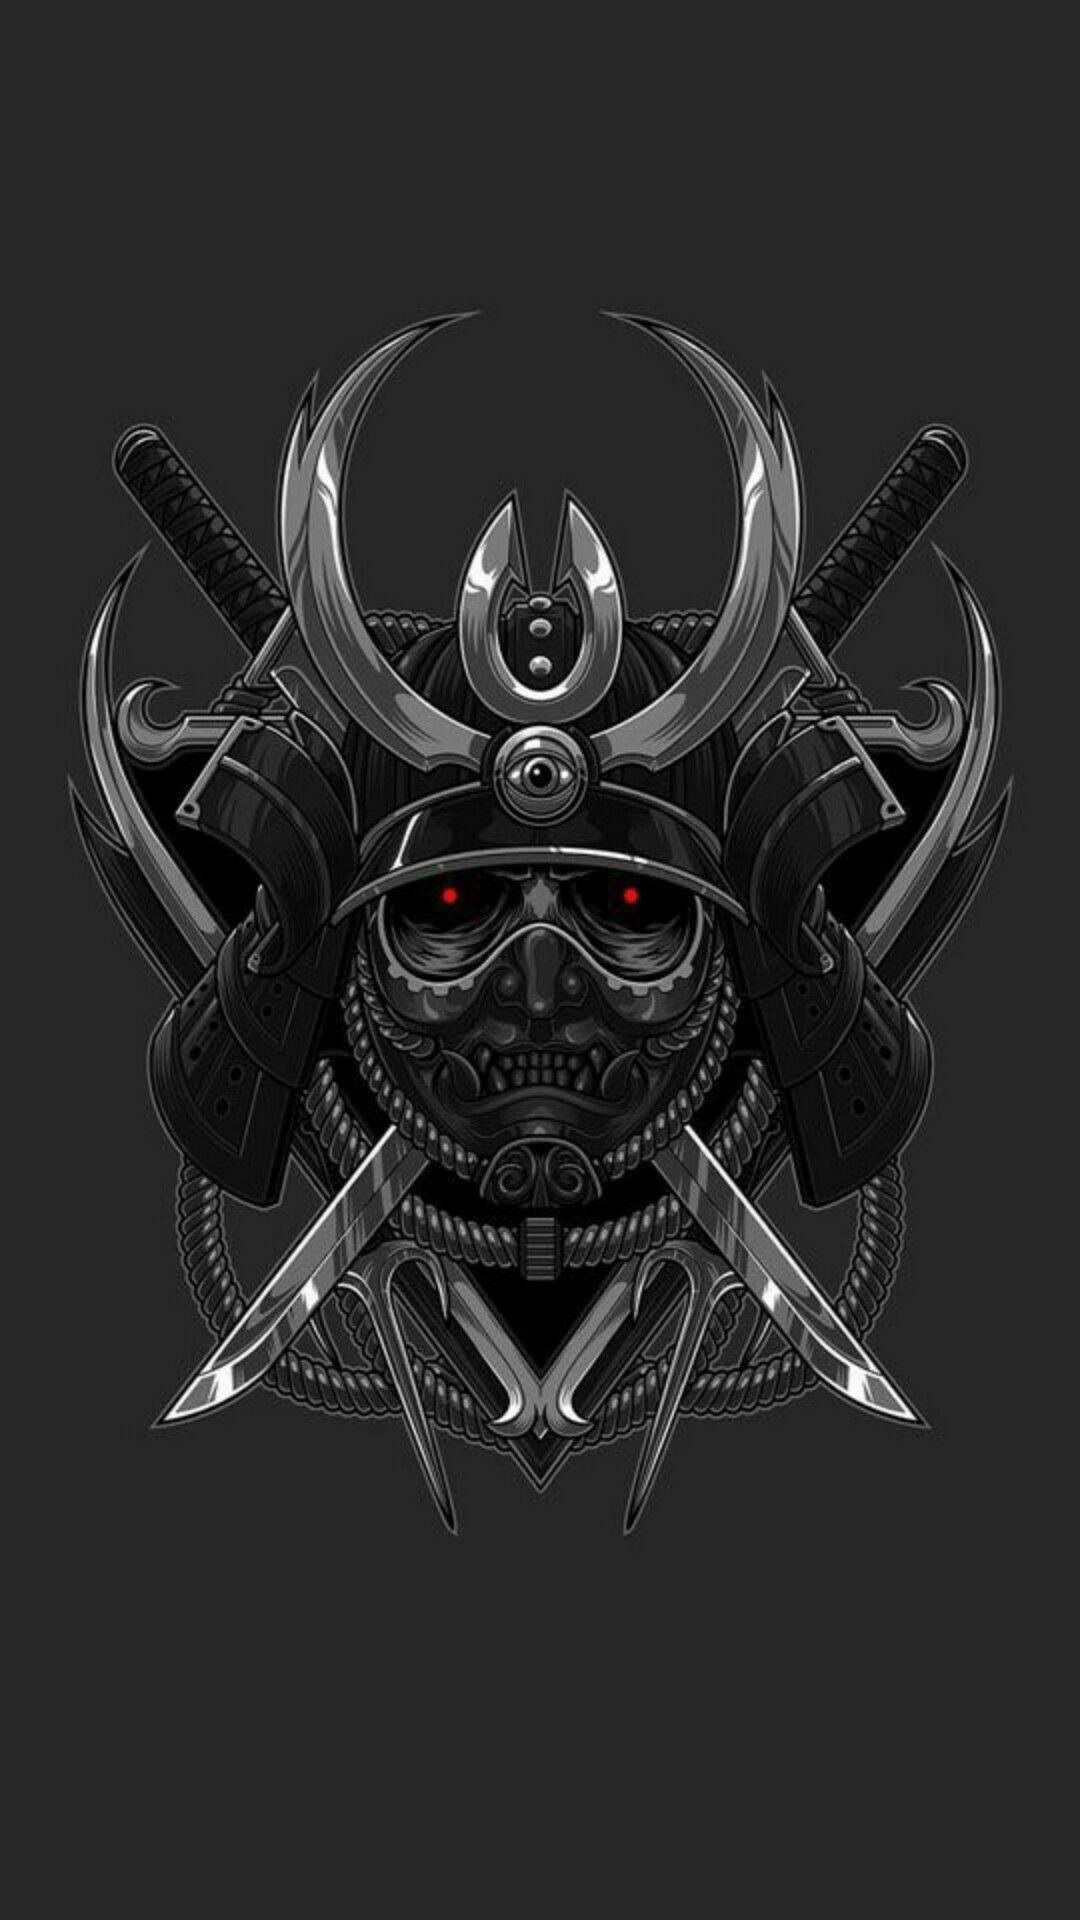 Oni Samurai Wallpapers - Top Free Oni Samurai Backgrounds ...